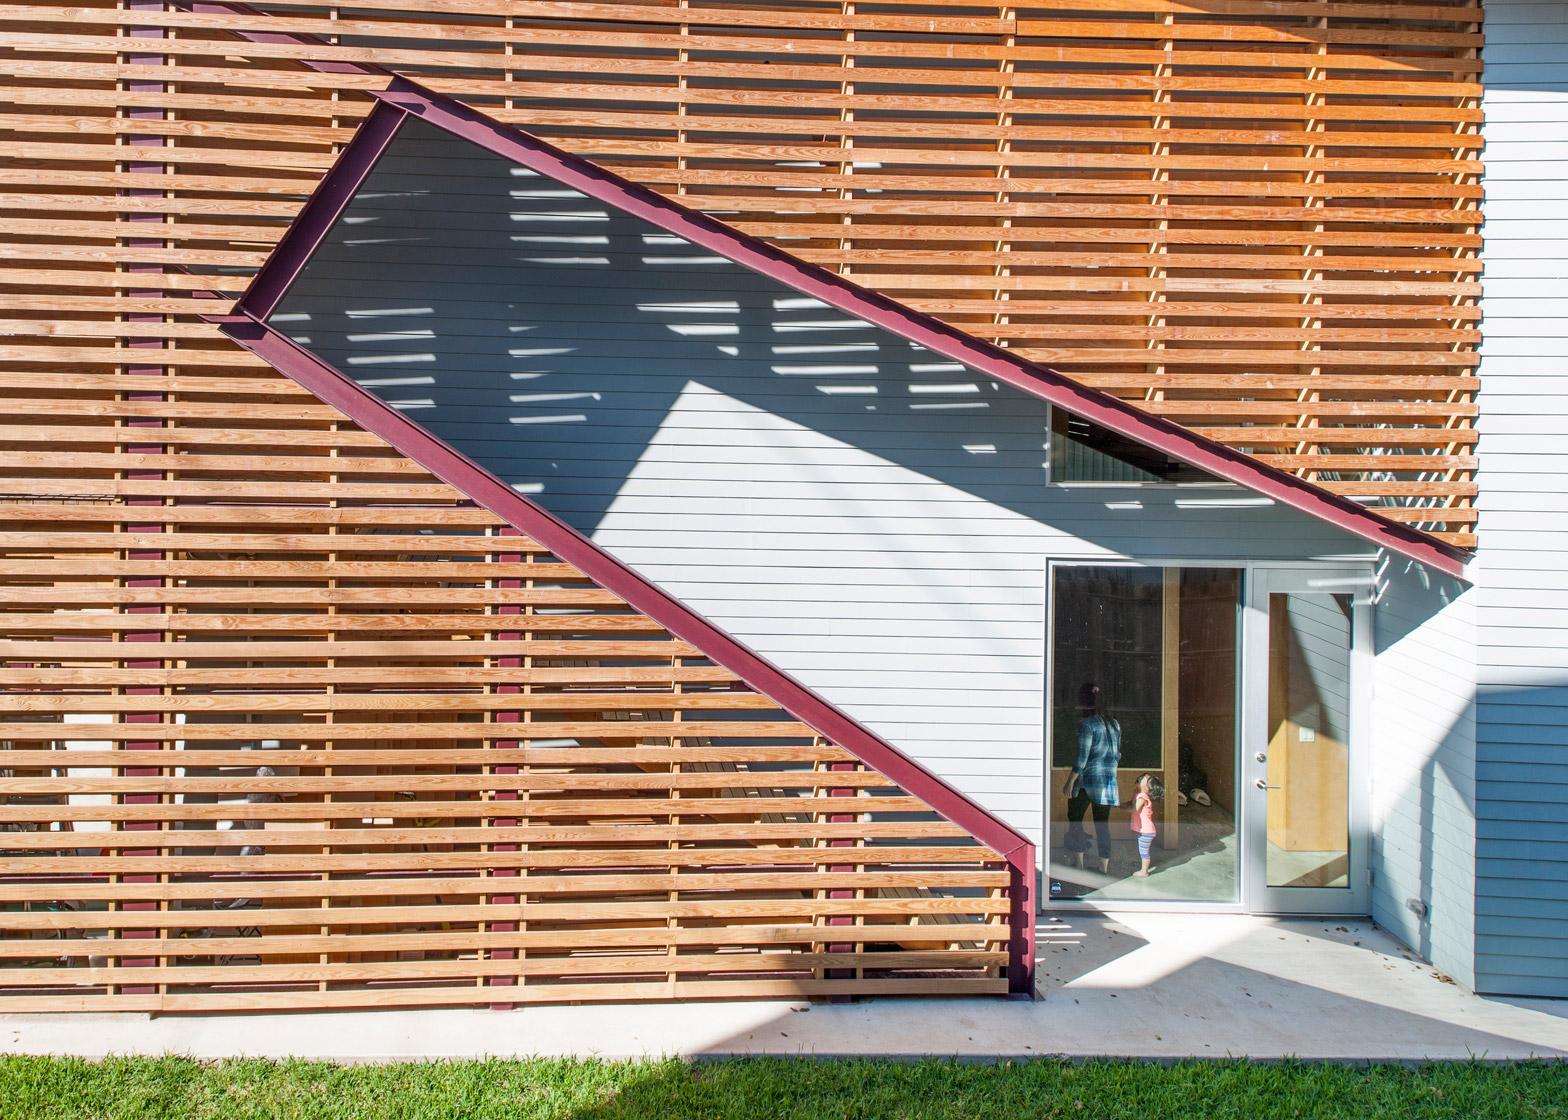 shotgun-chameleon-zdes-sustainable-house-timber-texas_dezeen_1568_4